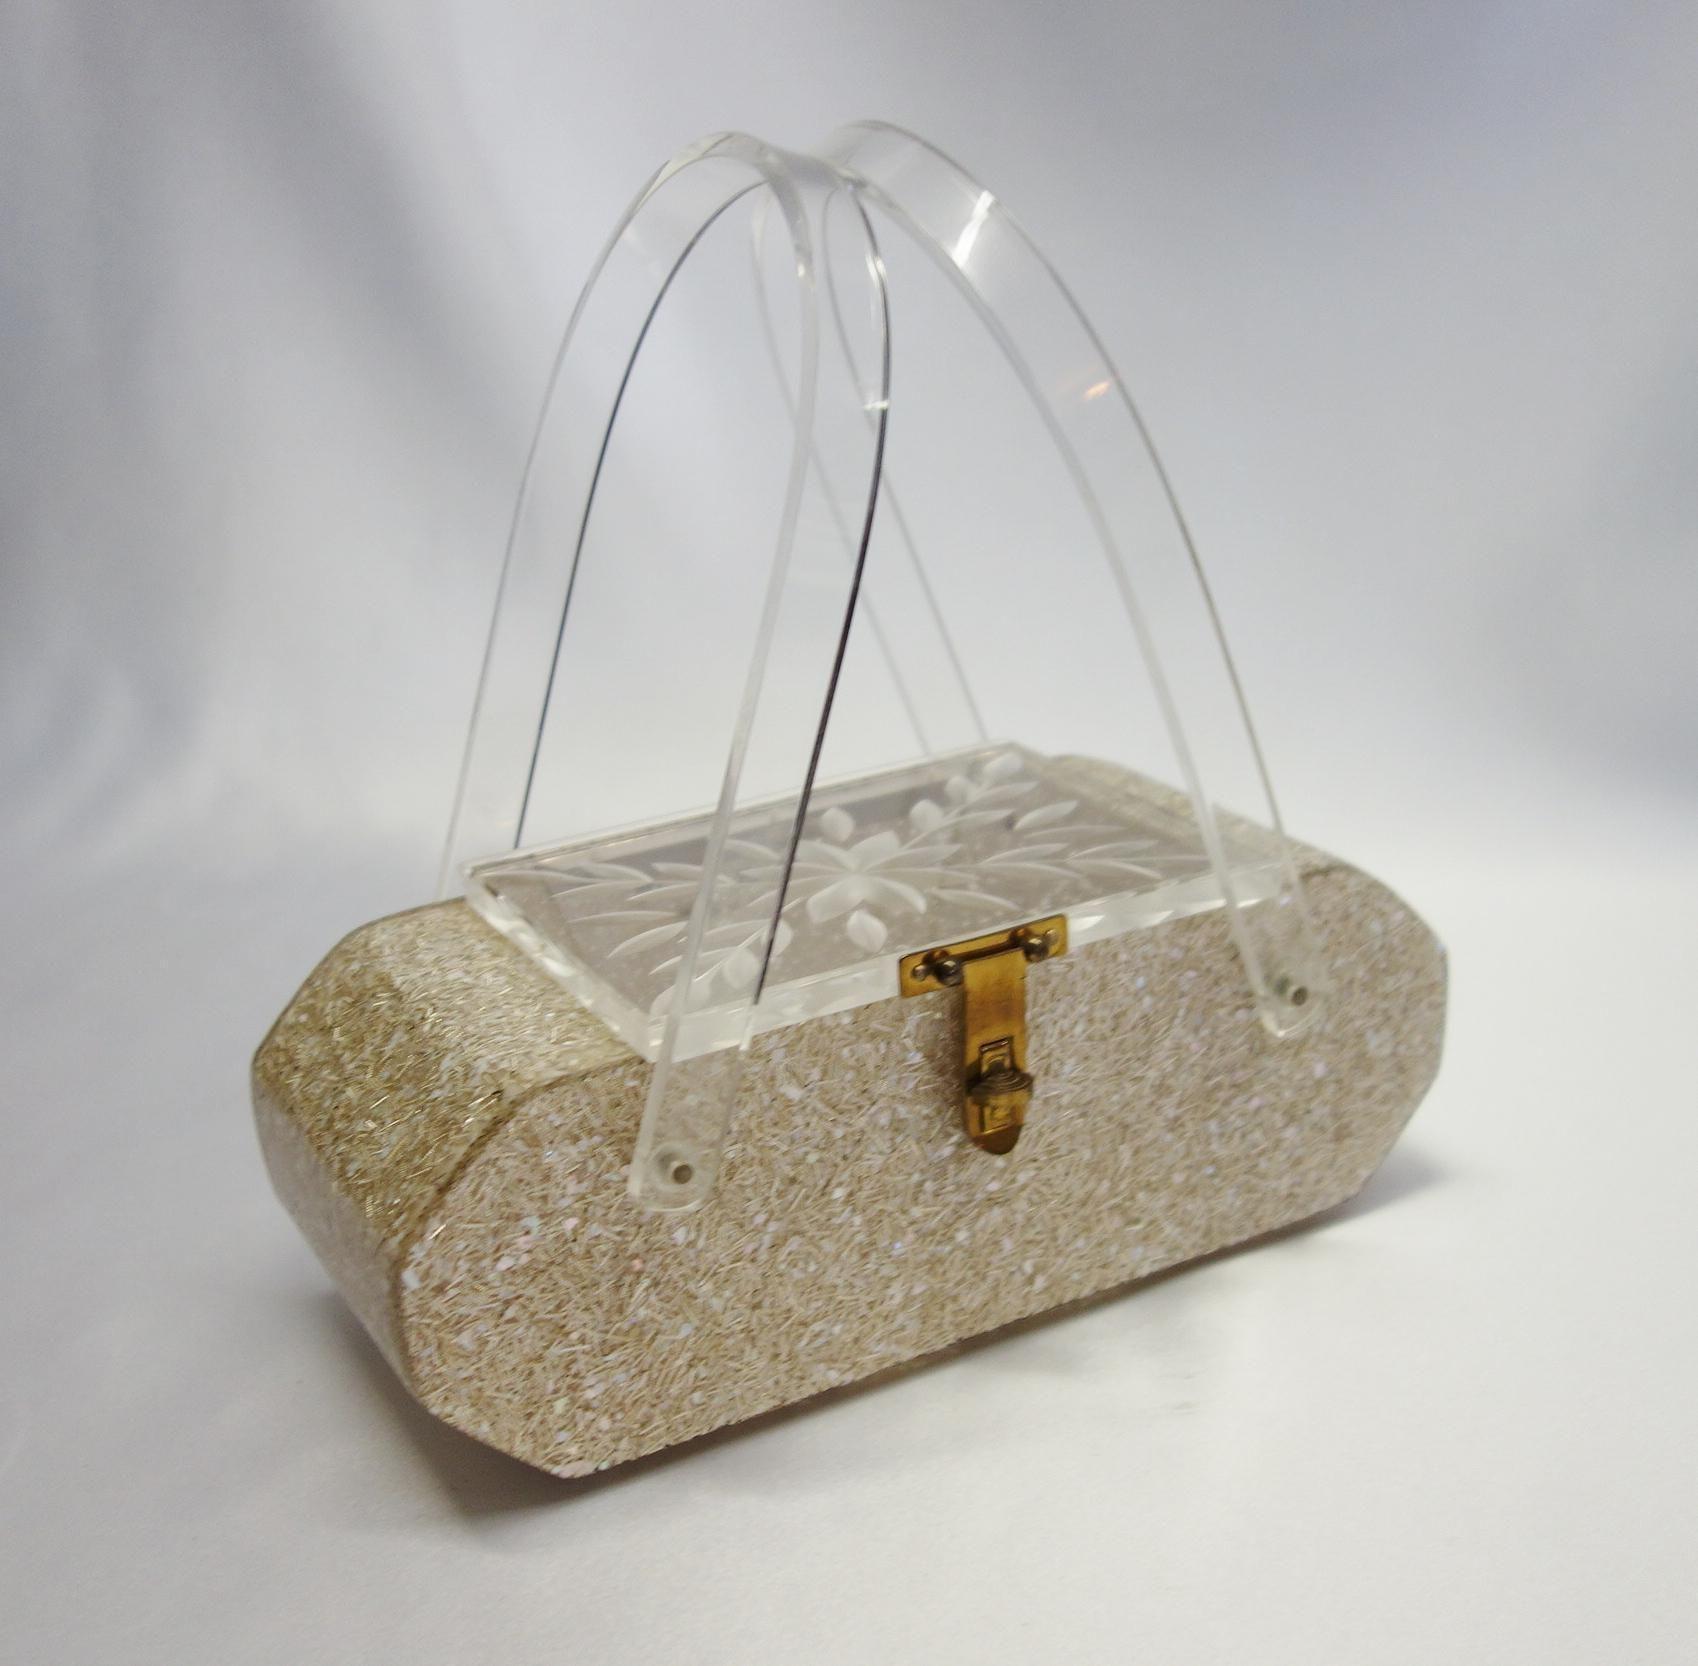 7c15f0c559bb Vintage Gold Confetti Lucite Purse by Florida Handbags of Miami ...